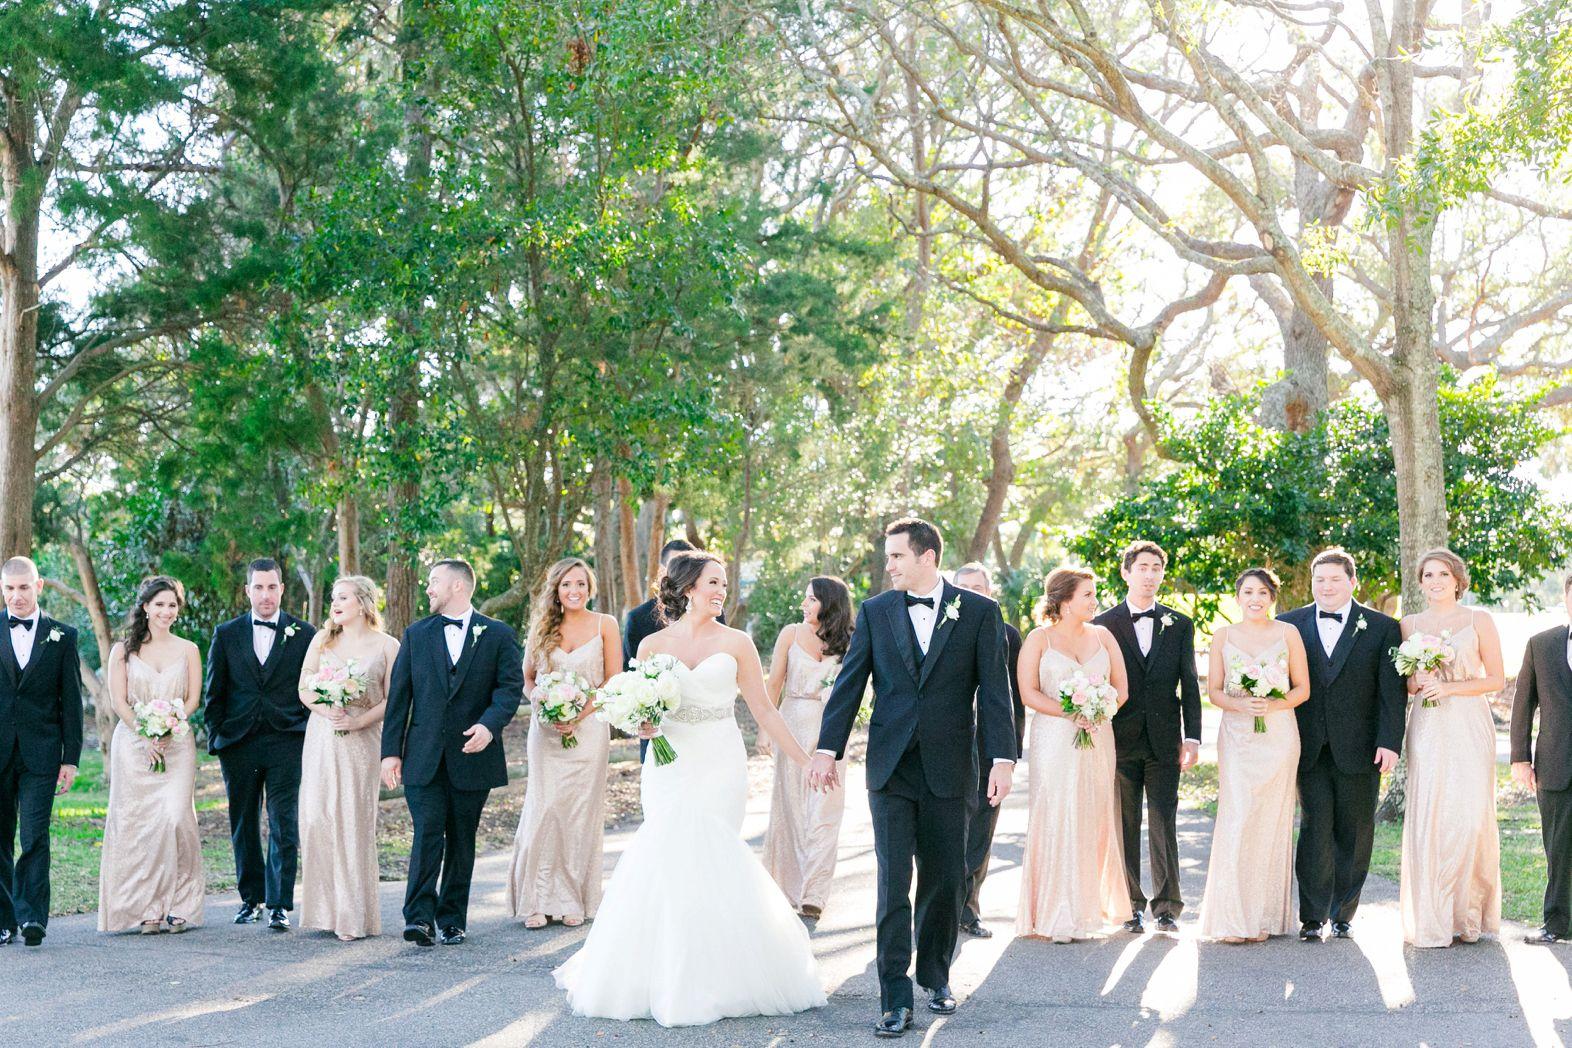 Blush Sequined Bridesmaid Dresses Black Tuxes Elegant Blush Gold Wedding At The Dunes Club In Blush Gold Wedding Black Tux Wedding Marine Wedding Colors [ 1048 x 1572 Pixel ]